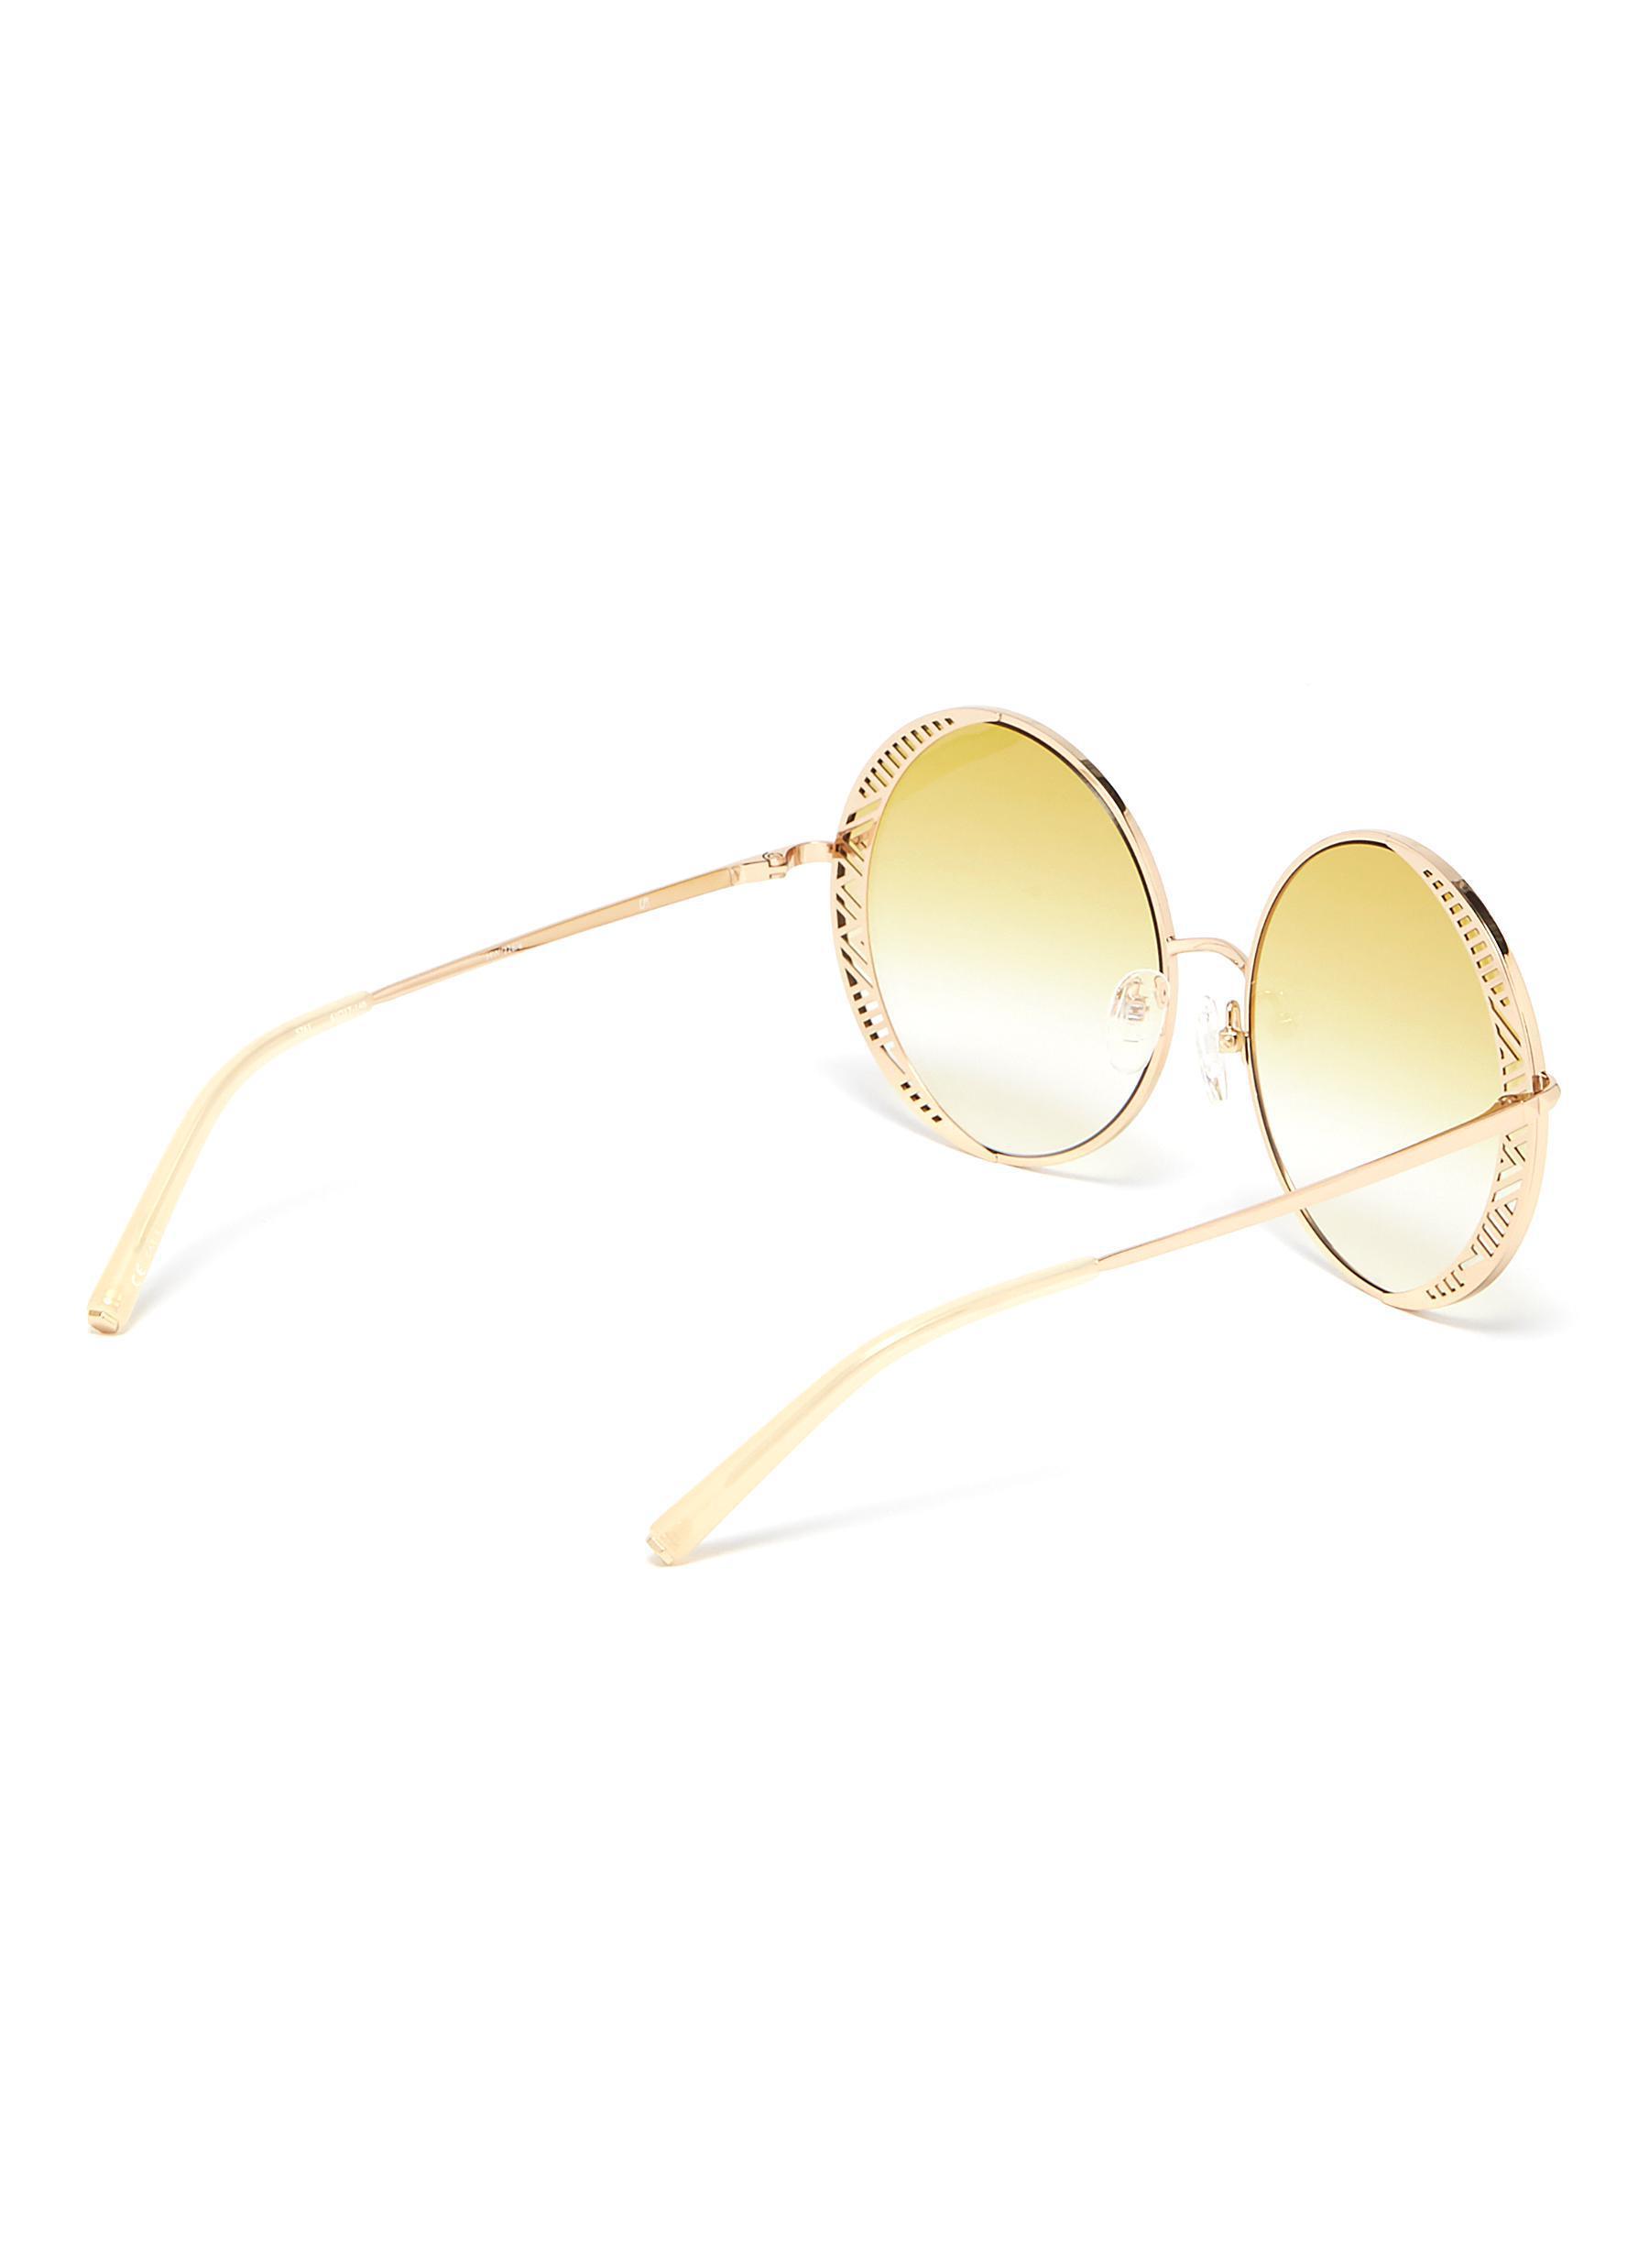 3ff05049306 Rim Men Sunglasses View Oversized Metal Fullscreen Lyst Matthew Williamson  Round For Cutout Yellow ZTzTxtqa